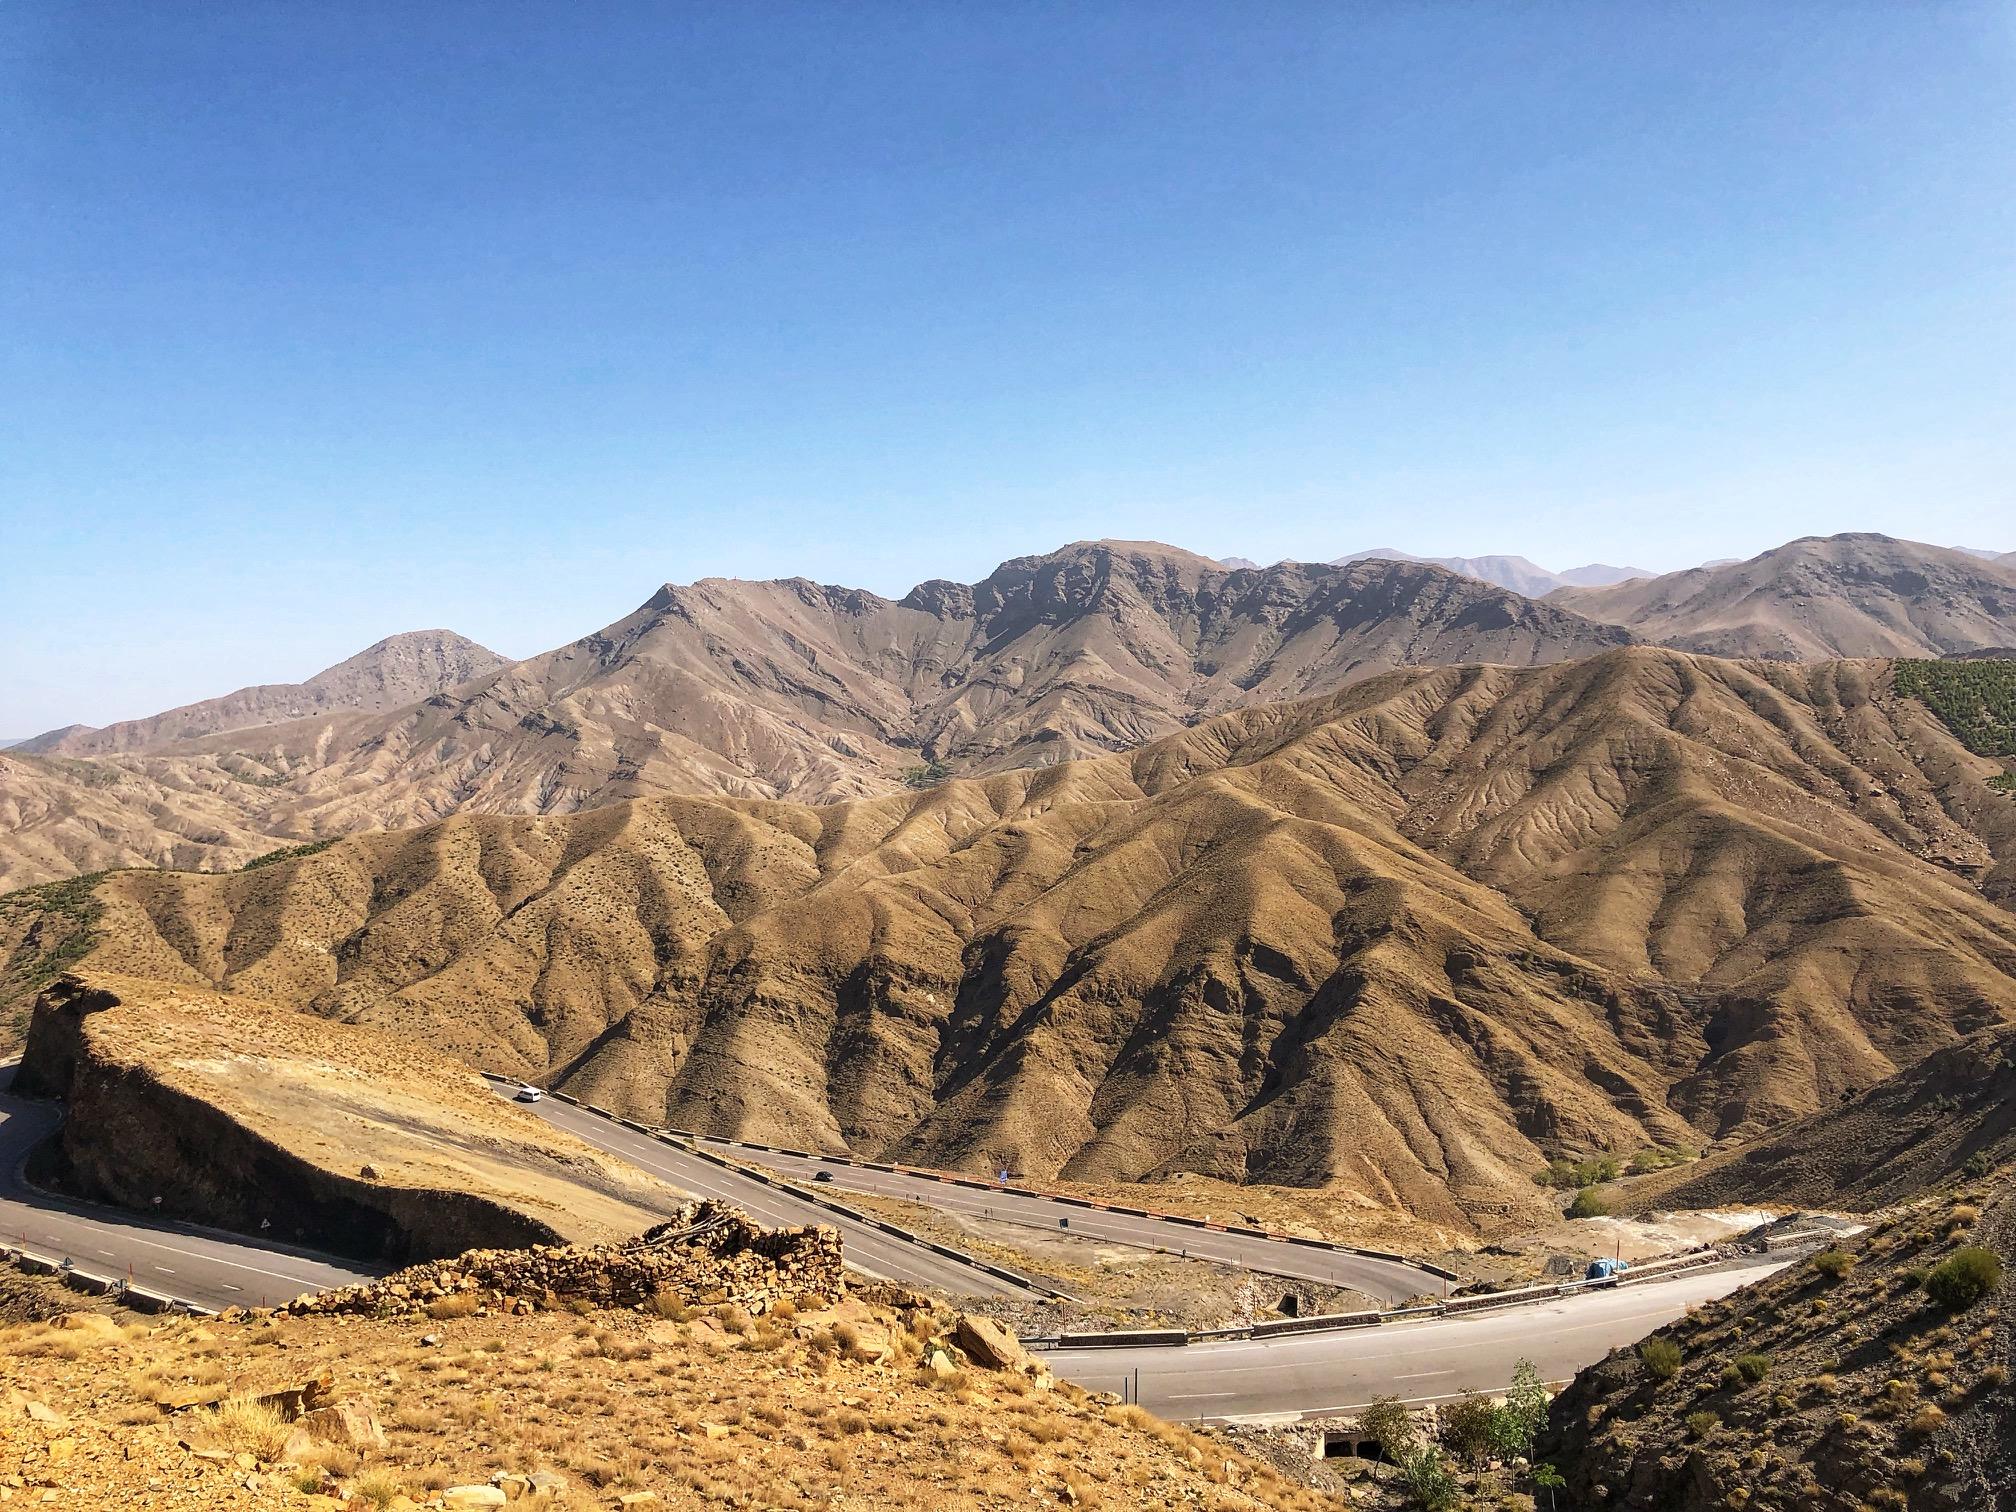 atlas mountains, morocco, the-alyst.com